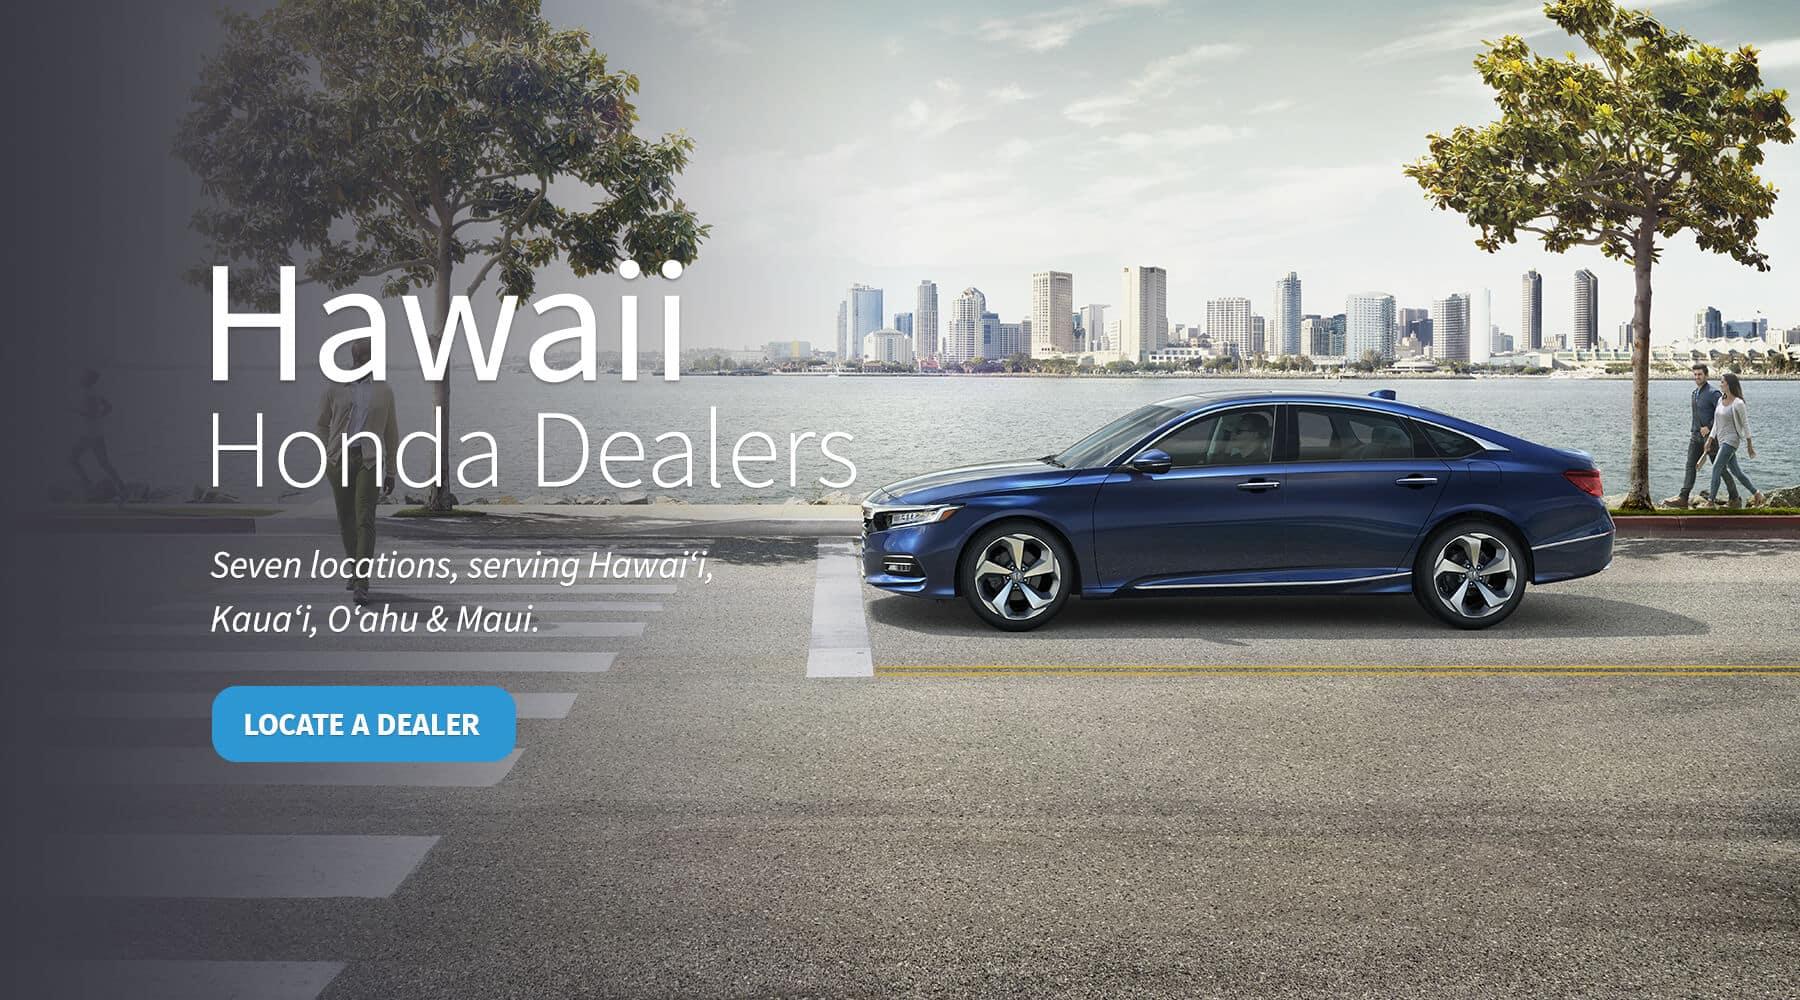 Hawaii Honda Dealers Locate a Dealer HP Slide